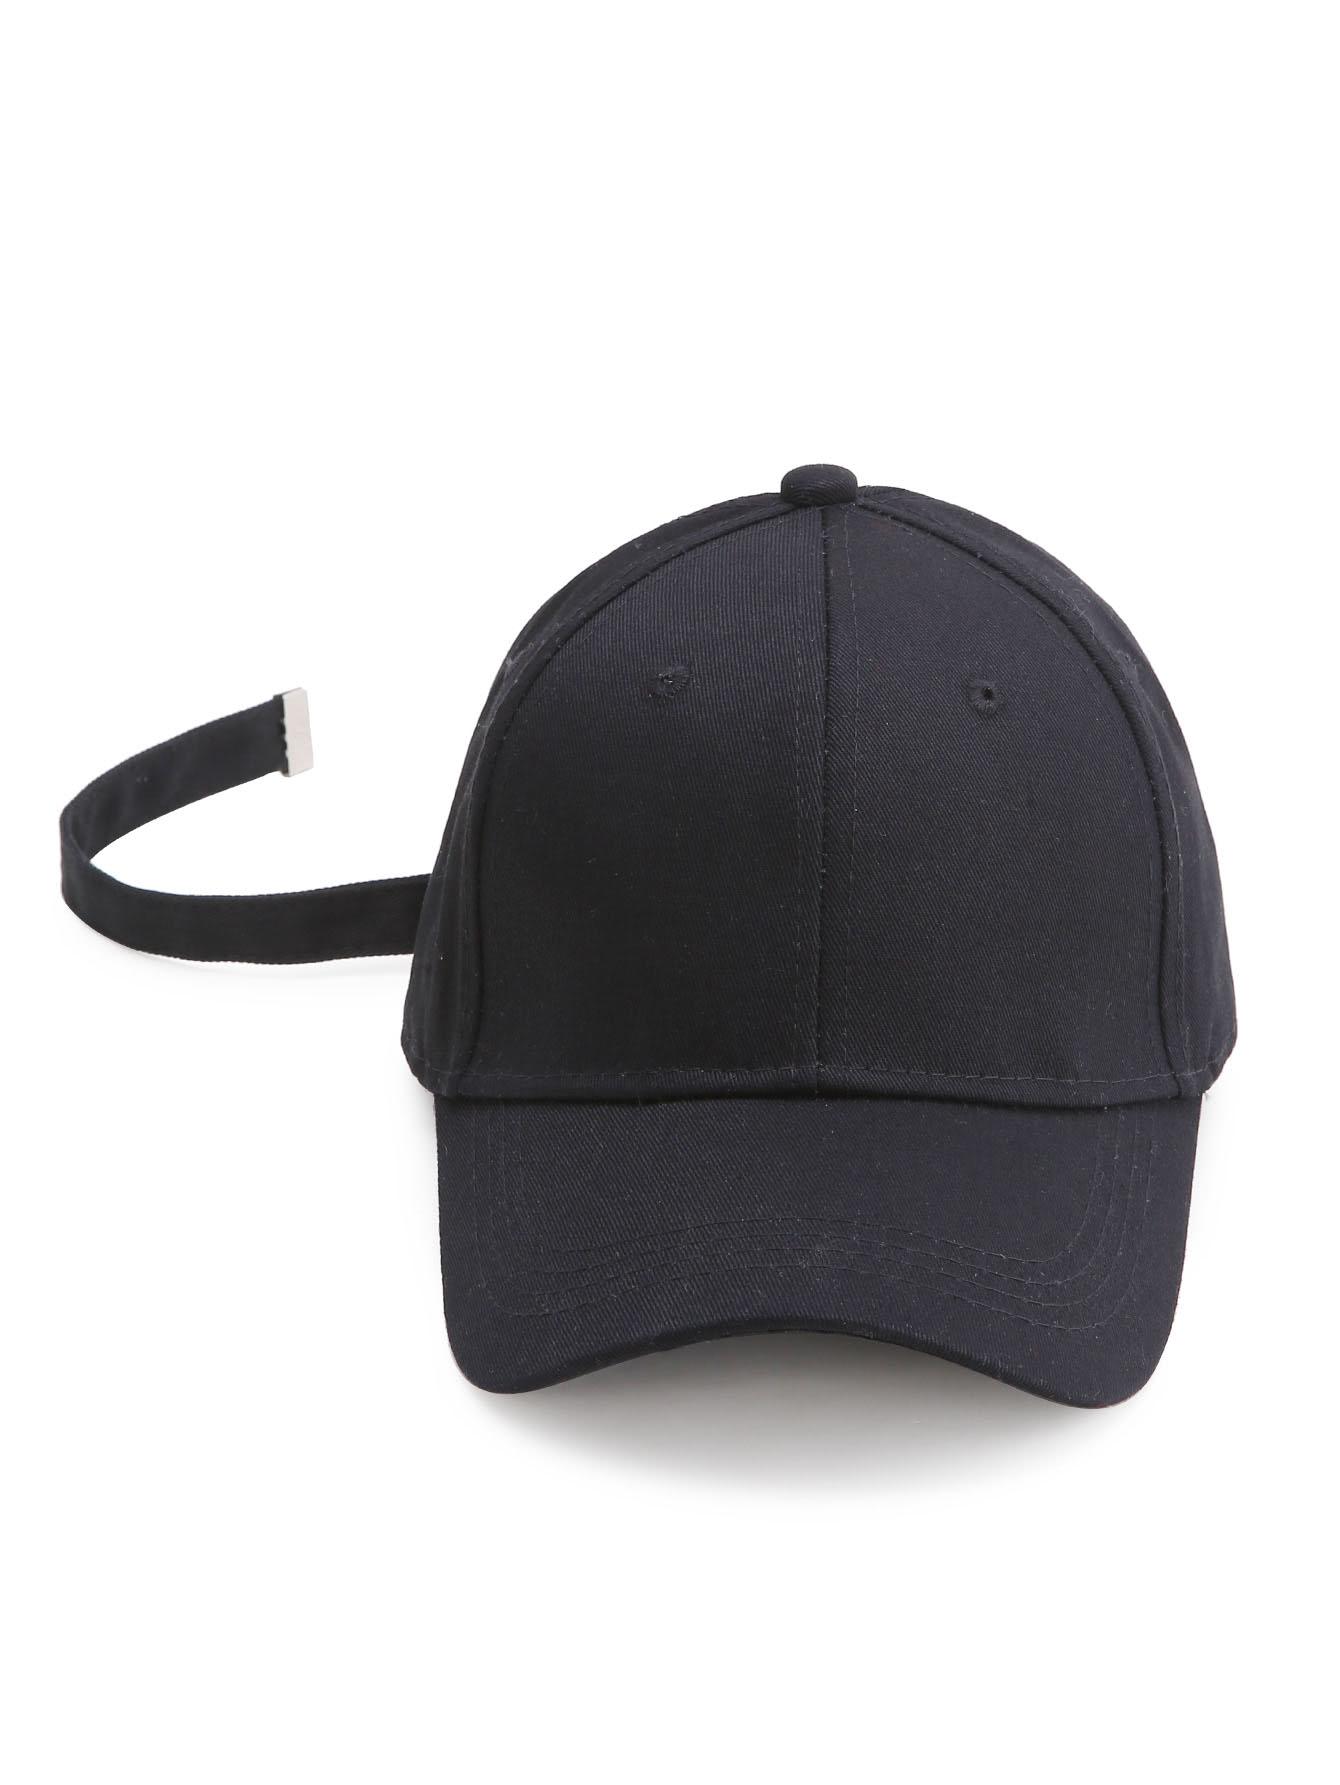 Black Baseball Cap With Strap